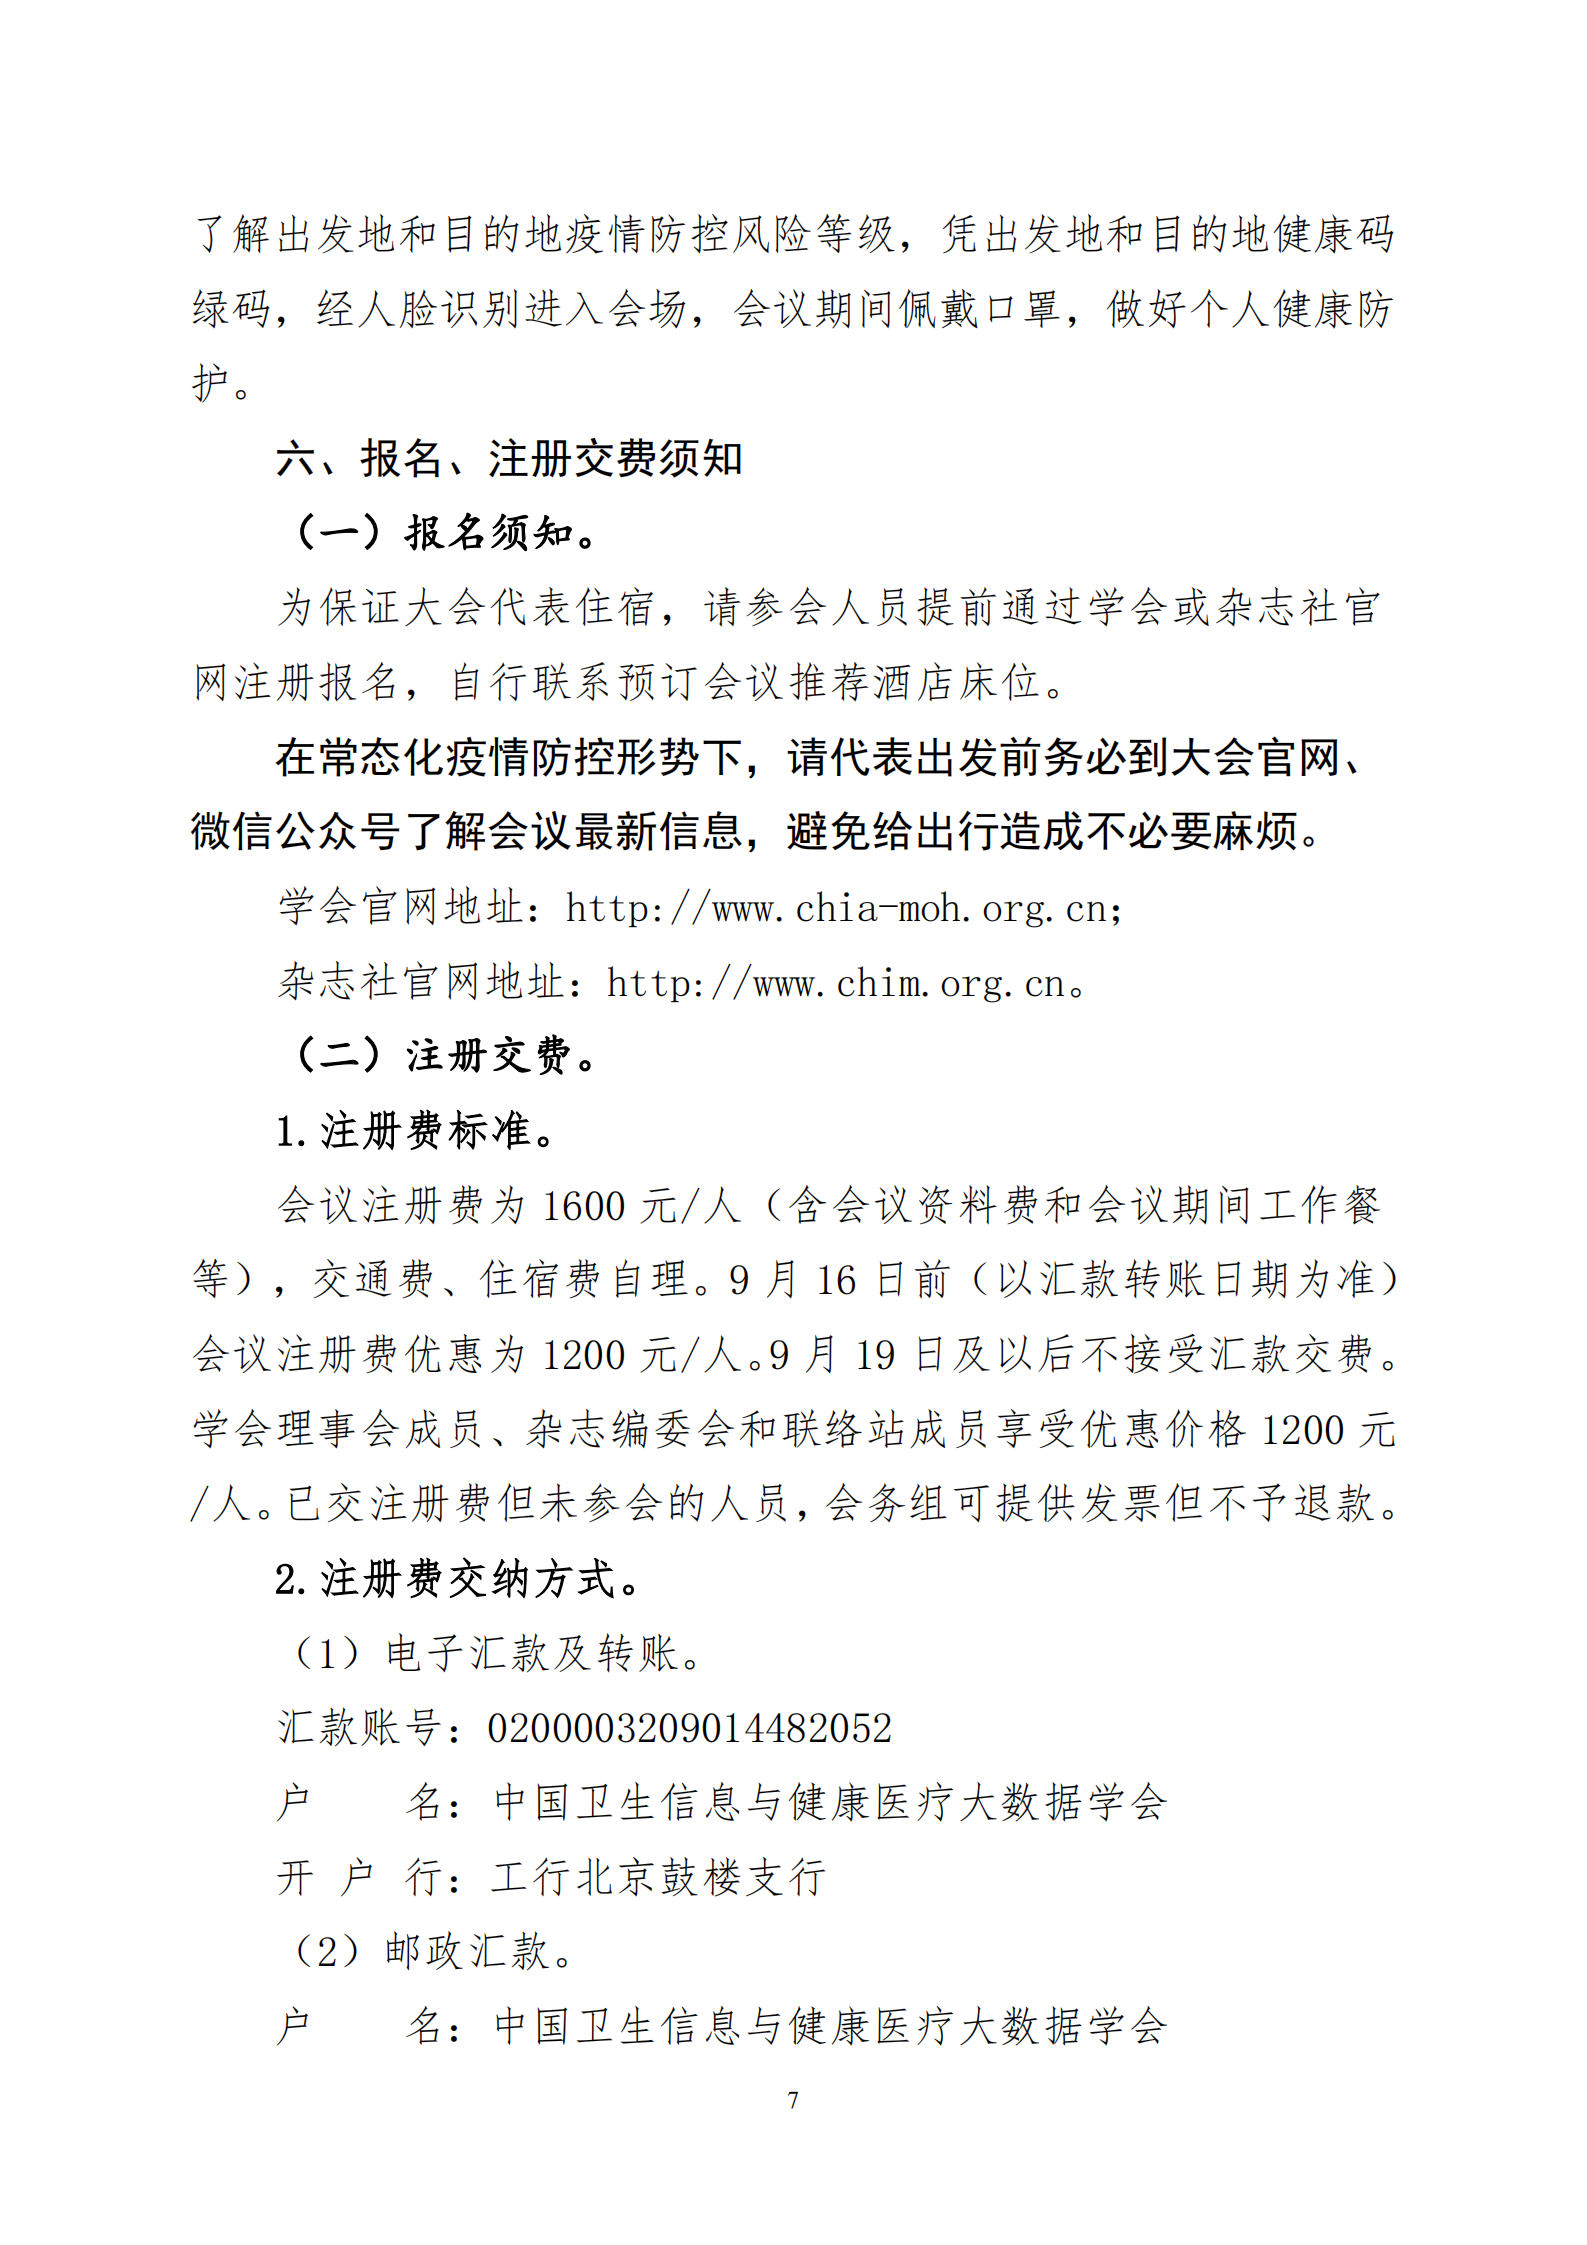 2020 CHIETC 大会通知_06.png